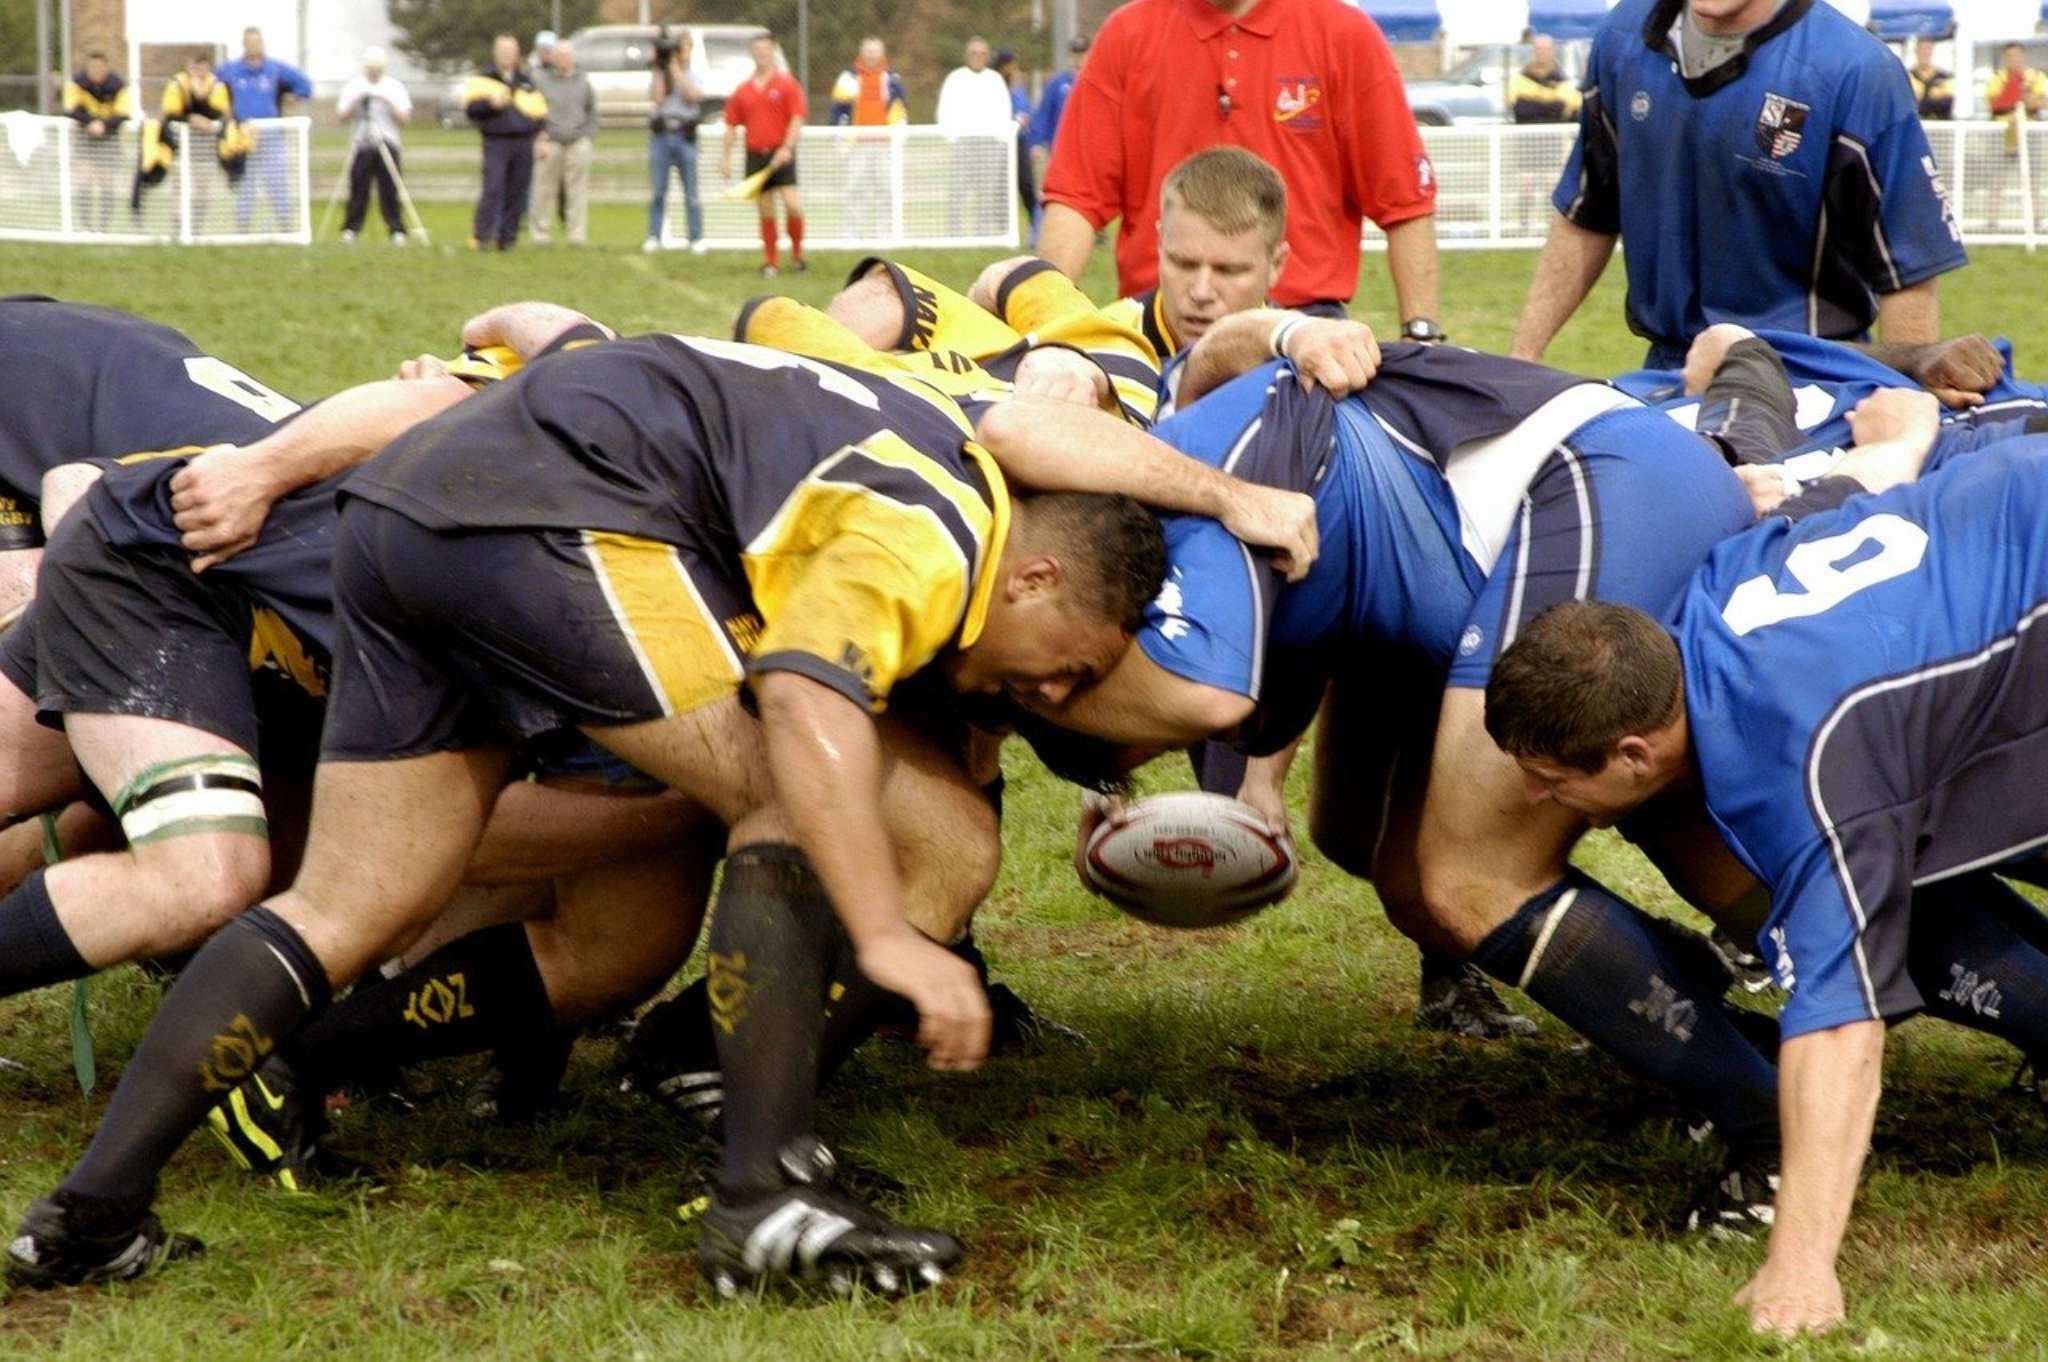 perché la palla da rugby è ovale